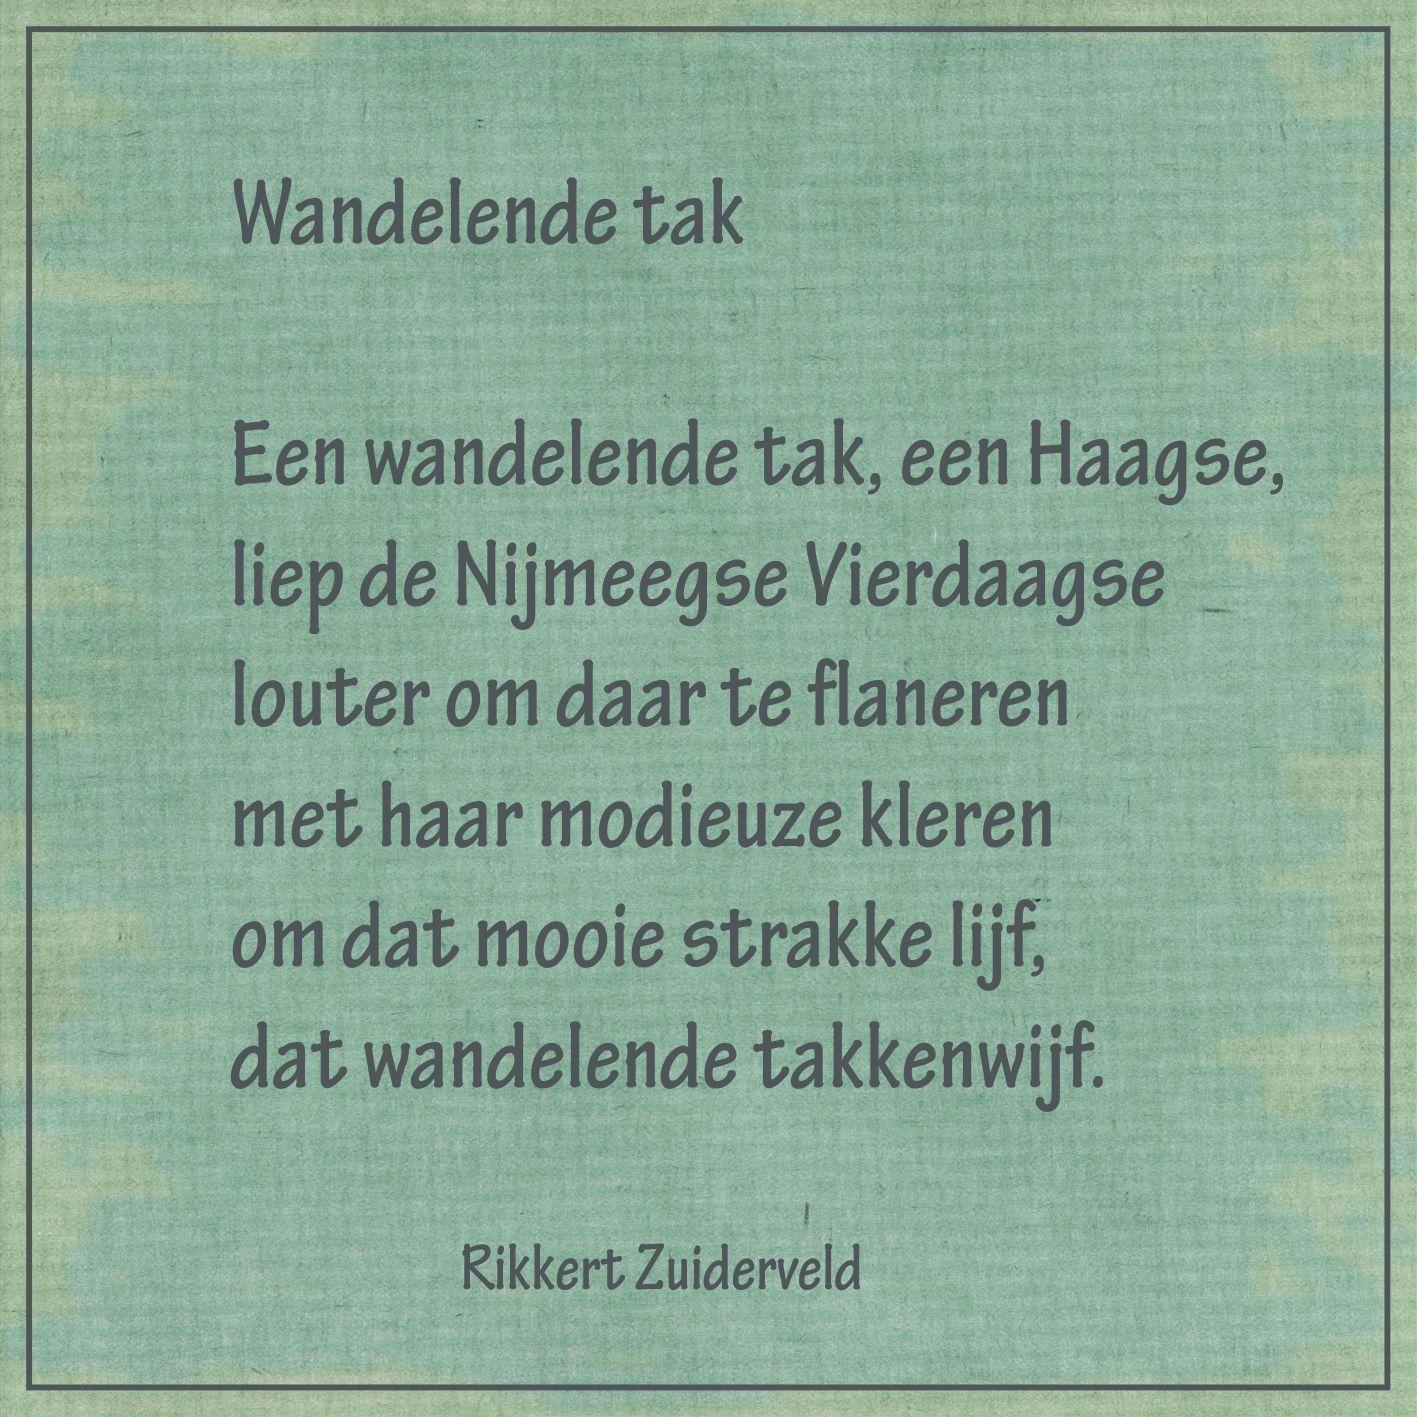 Wandelende tak - (dierengedichten van Rikkert Zuiderveld) -